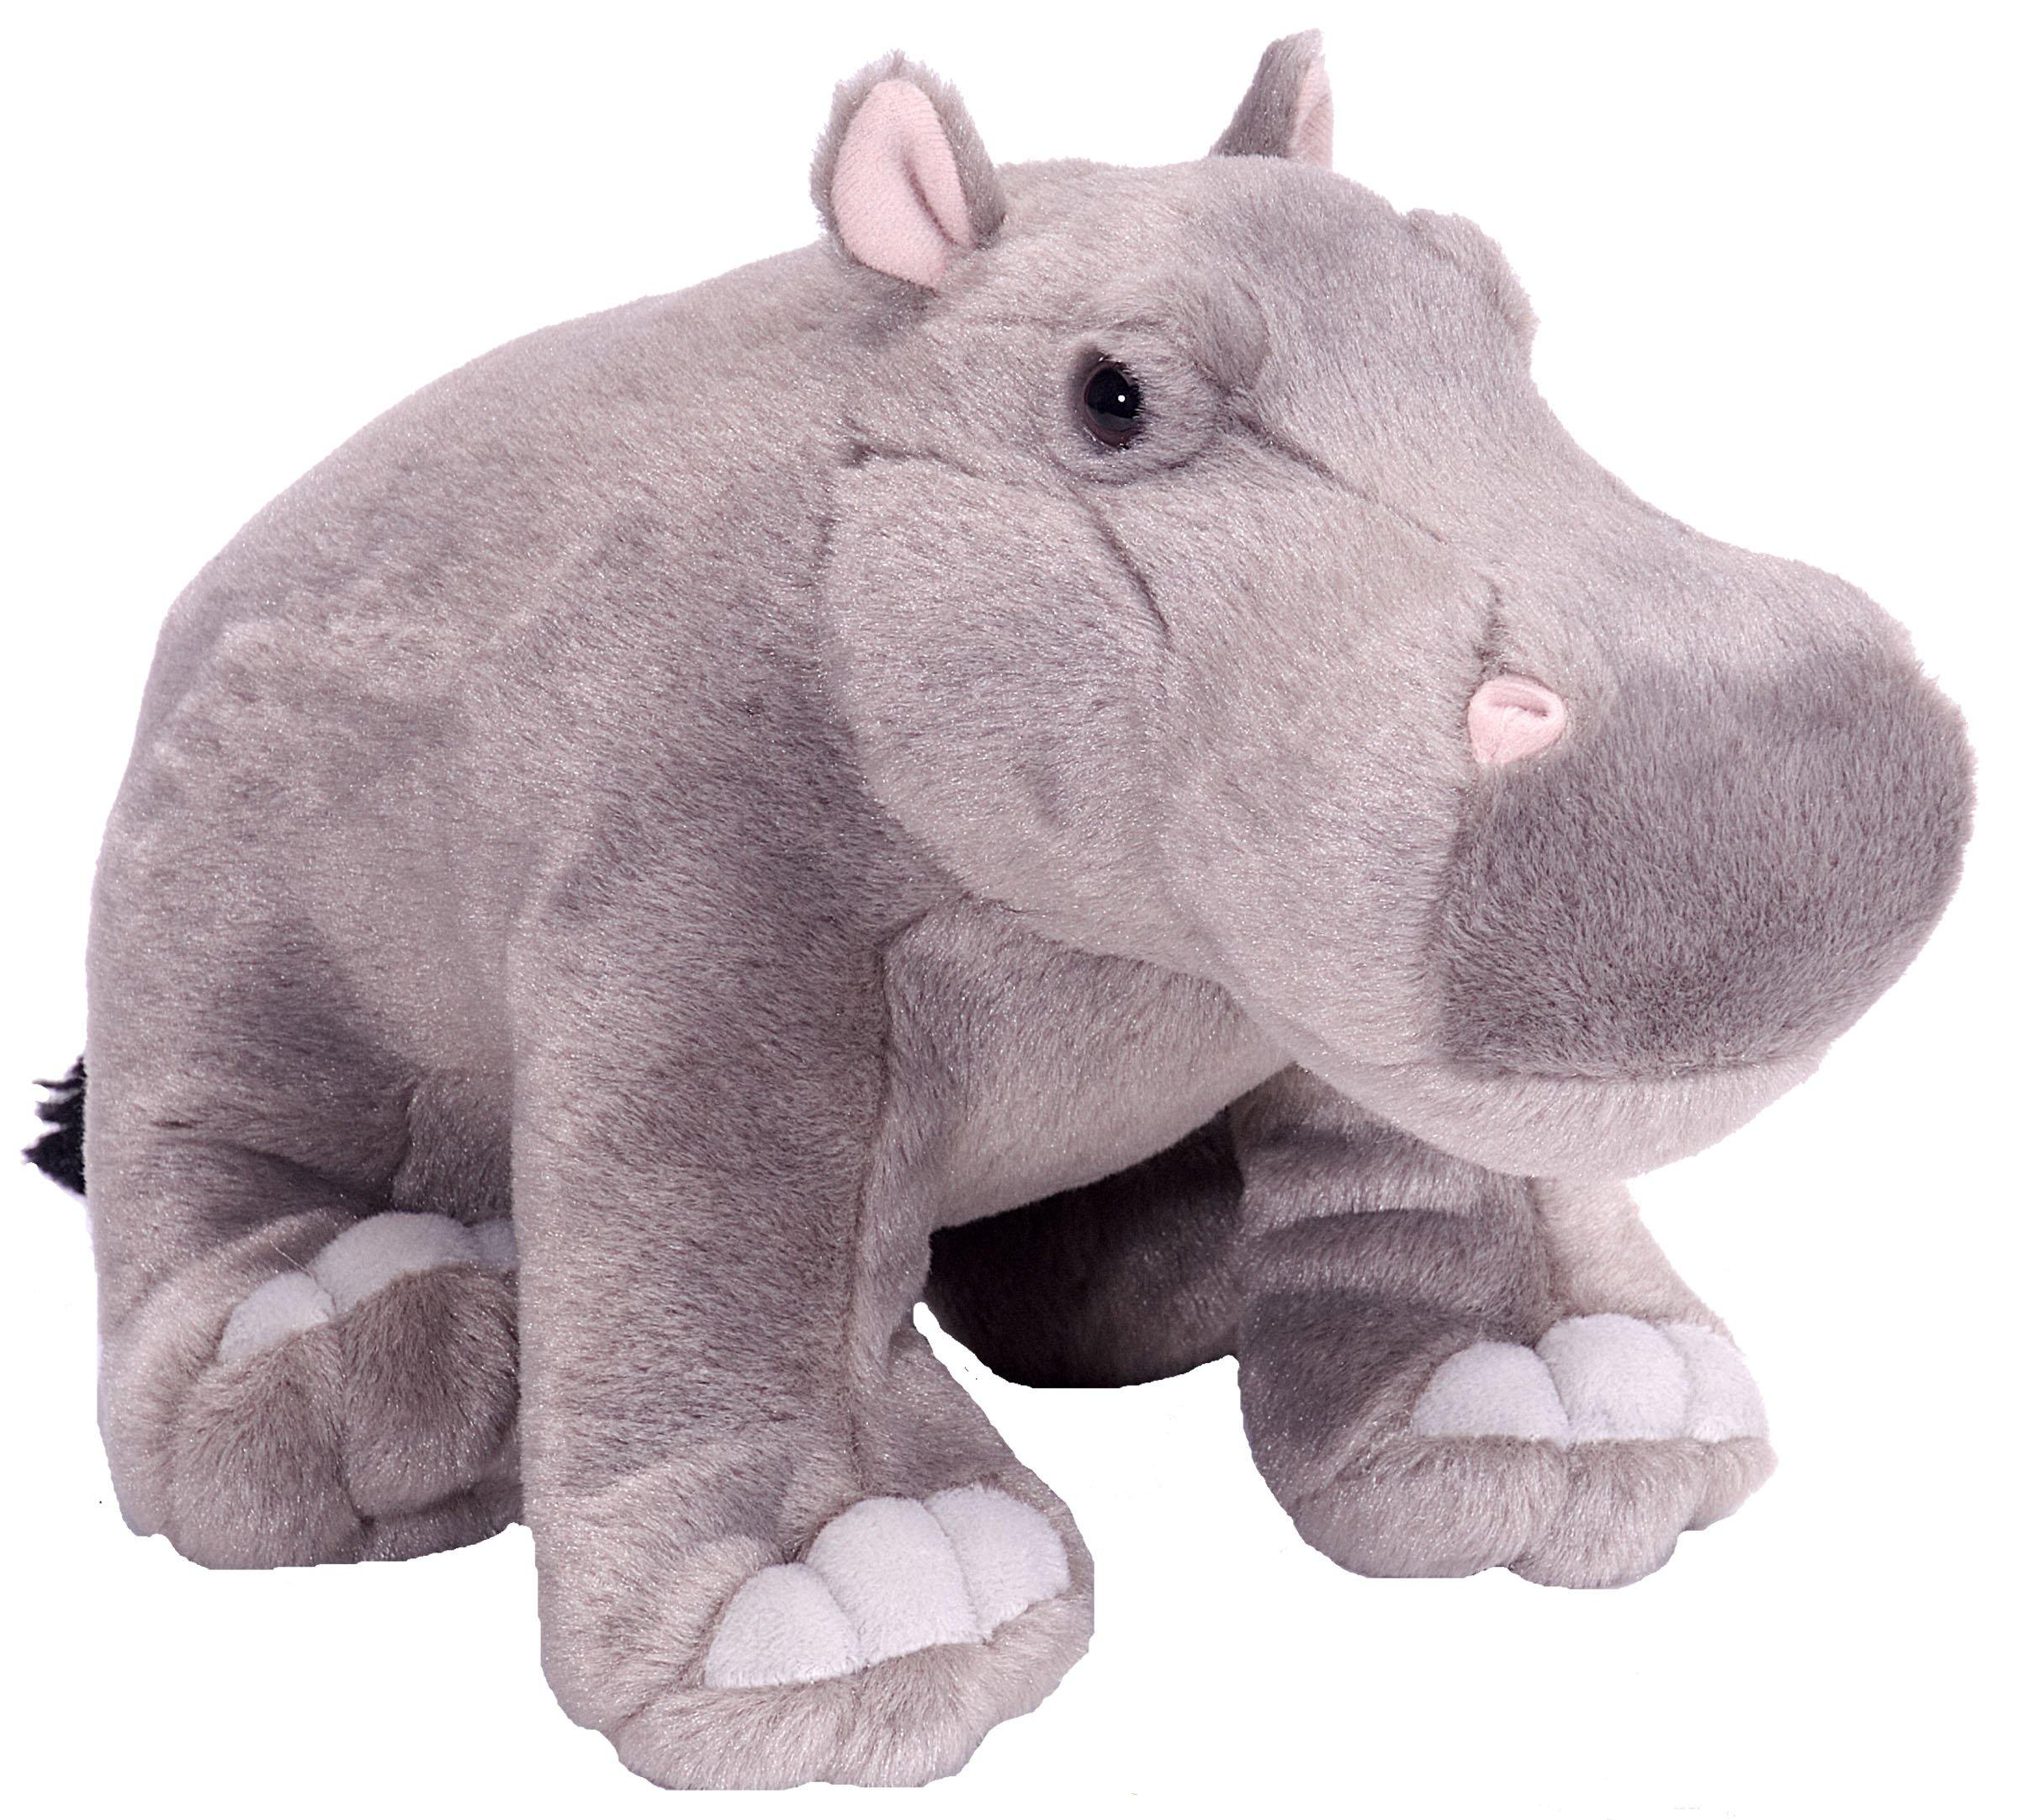 Wild Republic Hippo Plush, Stuffed Animal, Plush Toy, Gifts for Kids, Cuddlekins 12 Inches